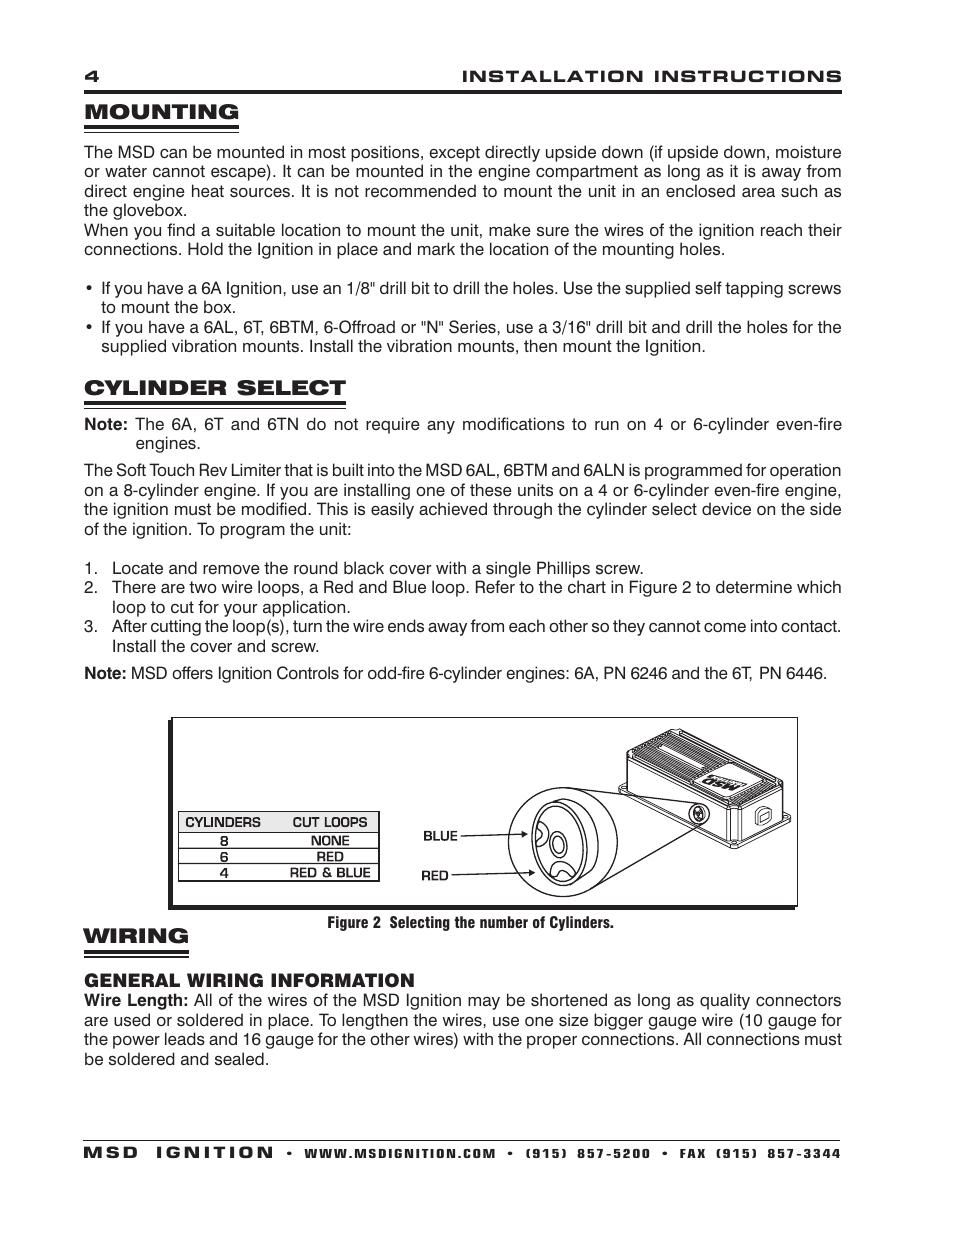 msd btm install porsche 911 parts diagram 6430 6aln ignition control installation user manual page 4 24